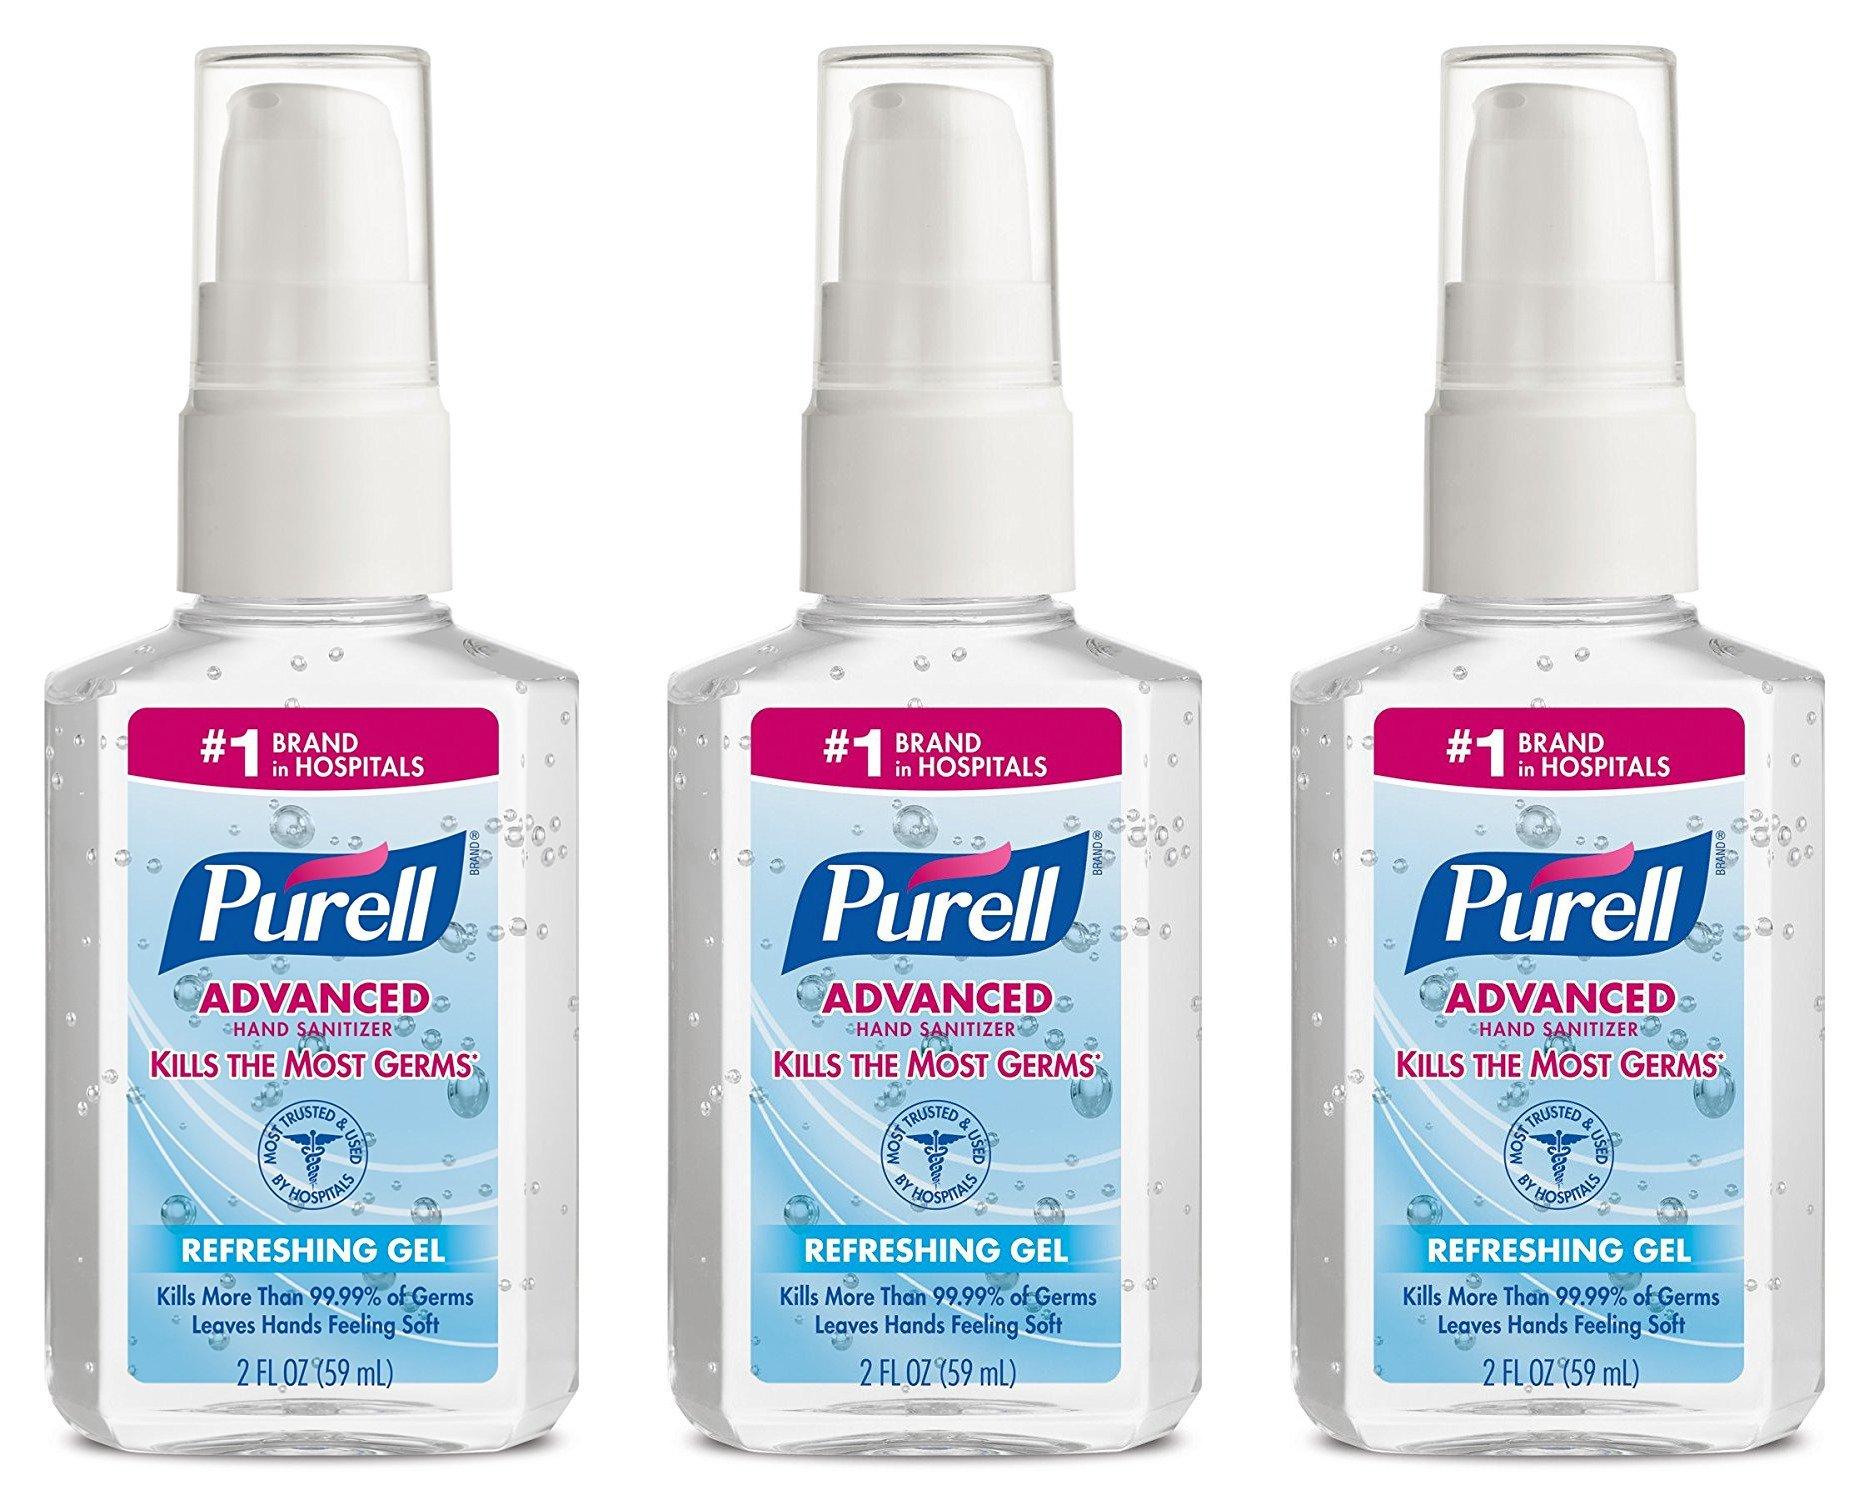 Purell Advanced Hand Sanitizer Refreshing Gel, Pump Bottle, 2 oz, 3-Pack